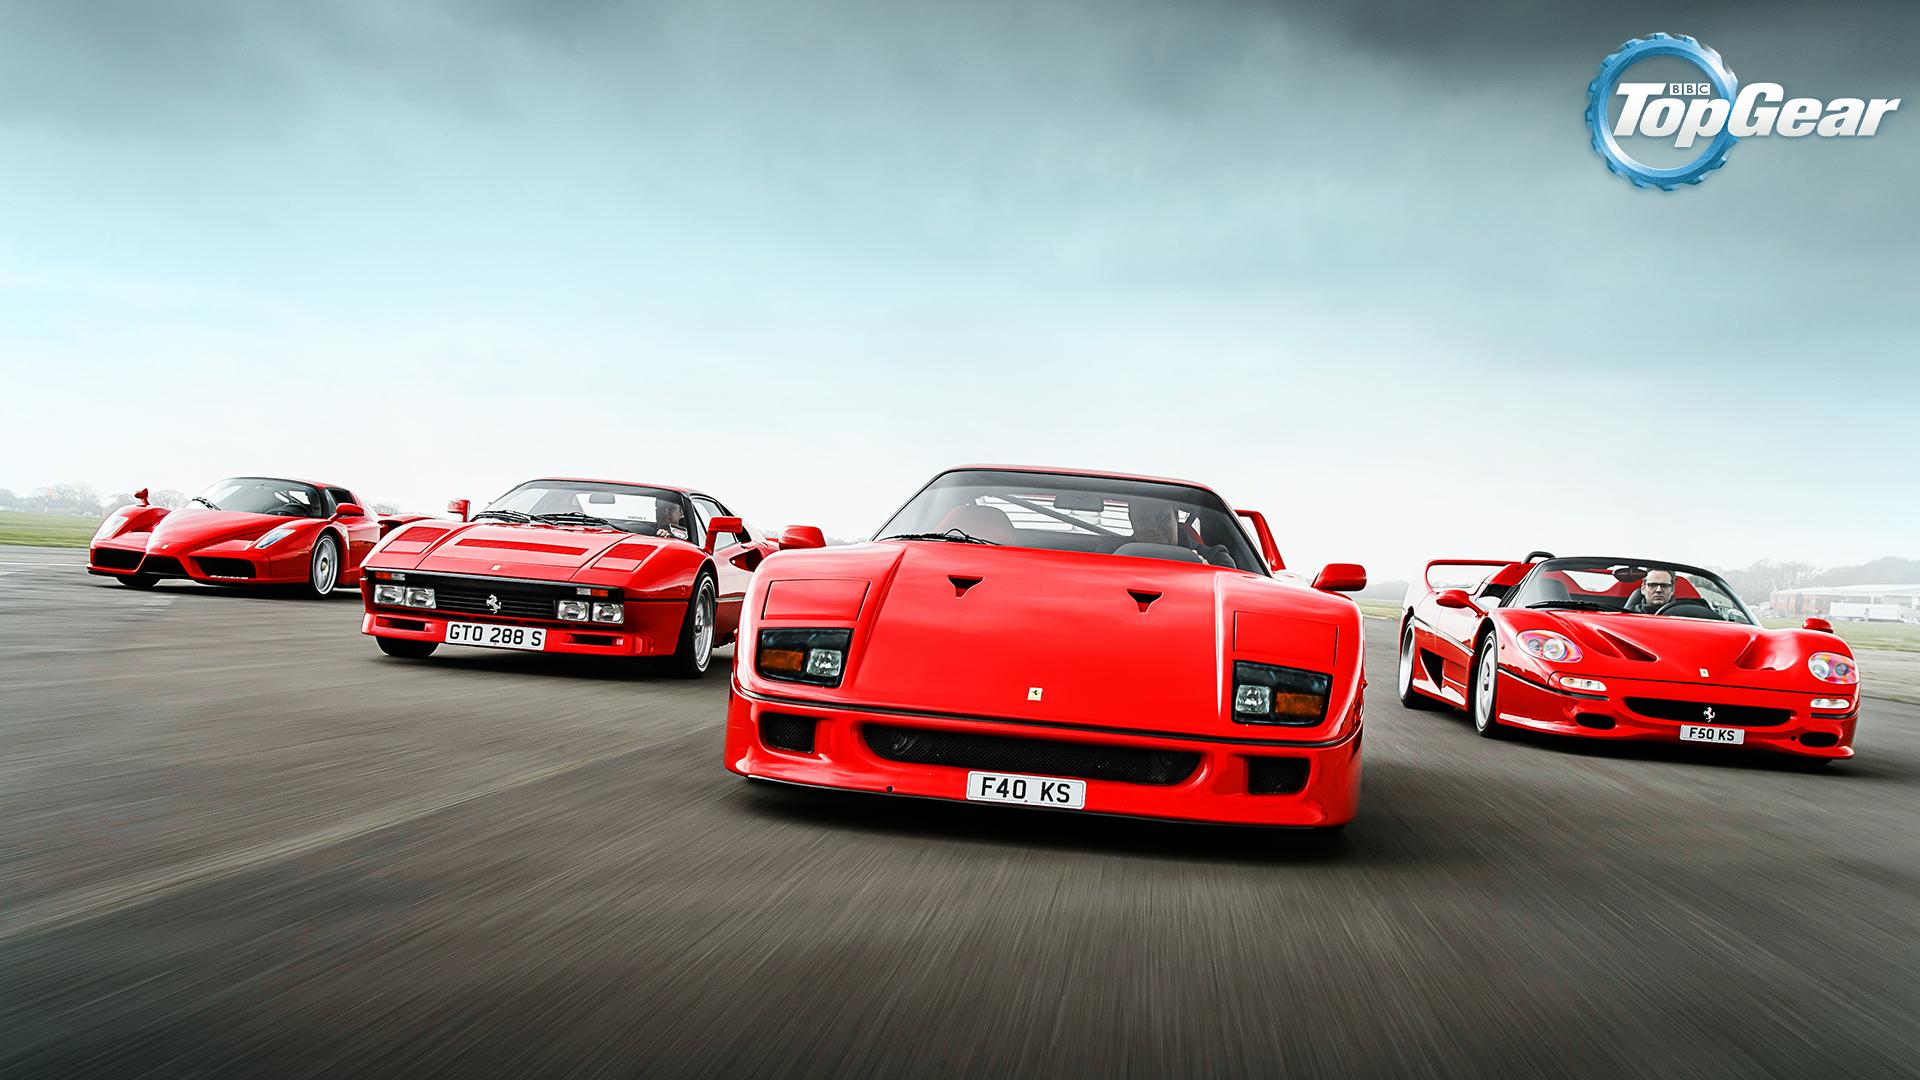 Laferrari Top View >> The Ferrari F40, F50, 288 GTO and Enzo Full HD Bakgrund and Bakgrund | 1920x1080 | ID:563524